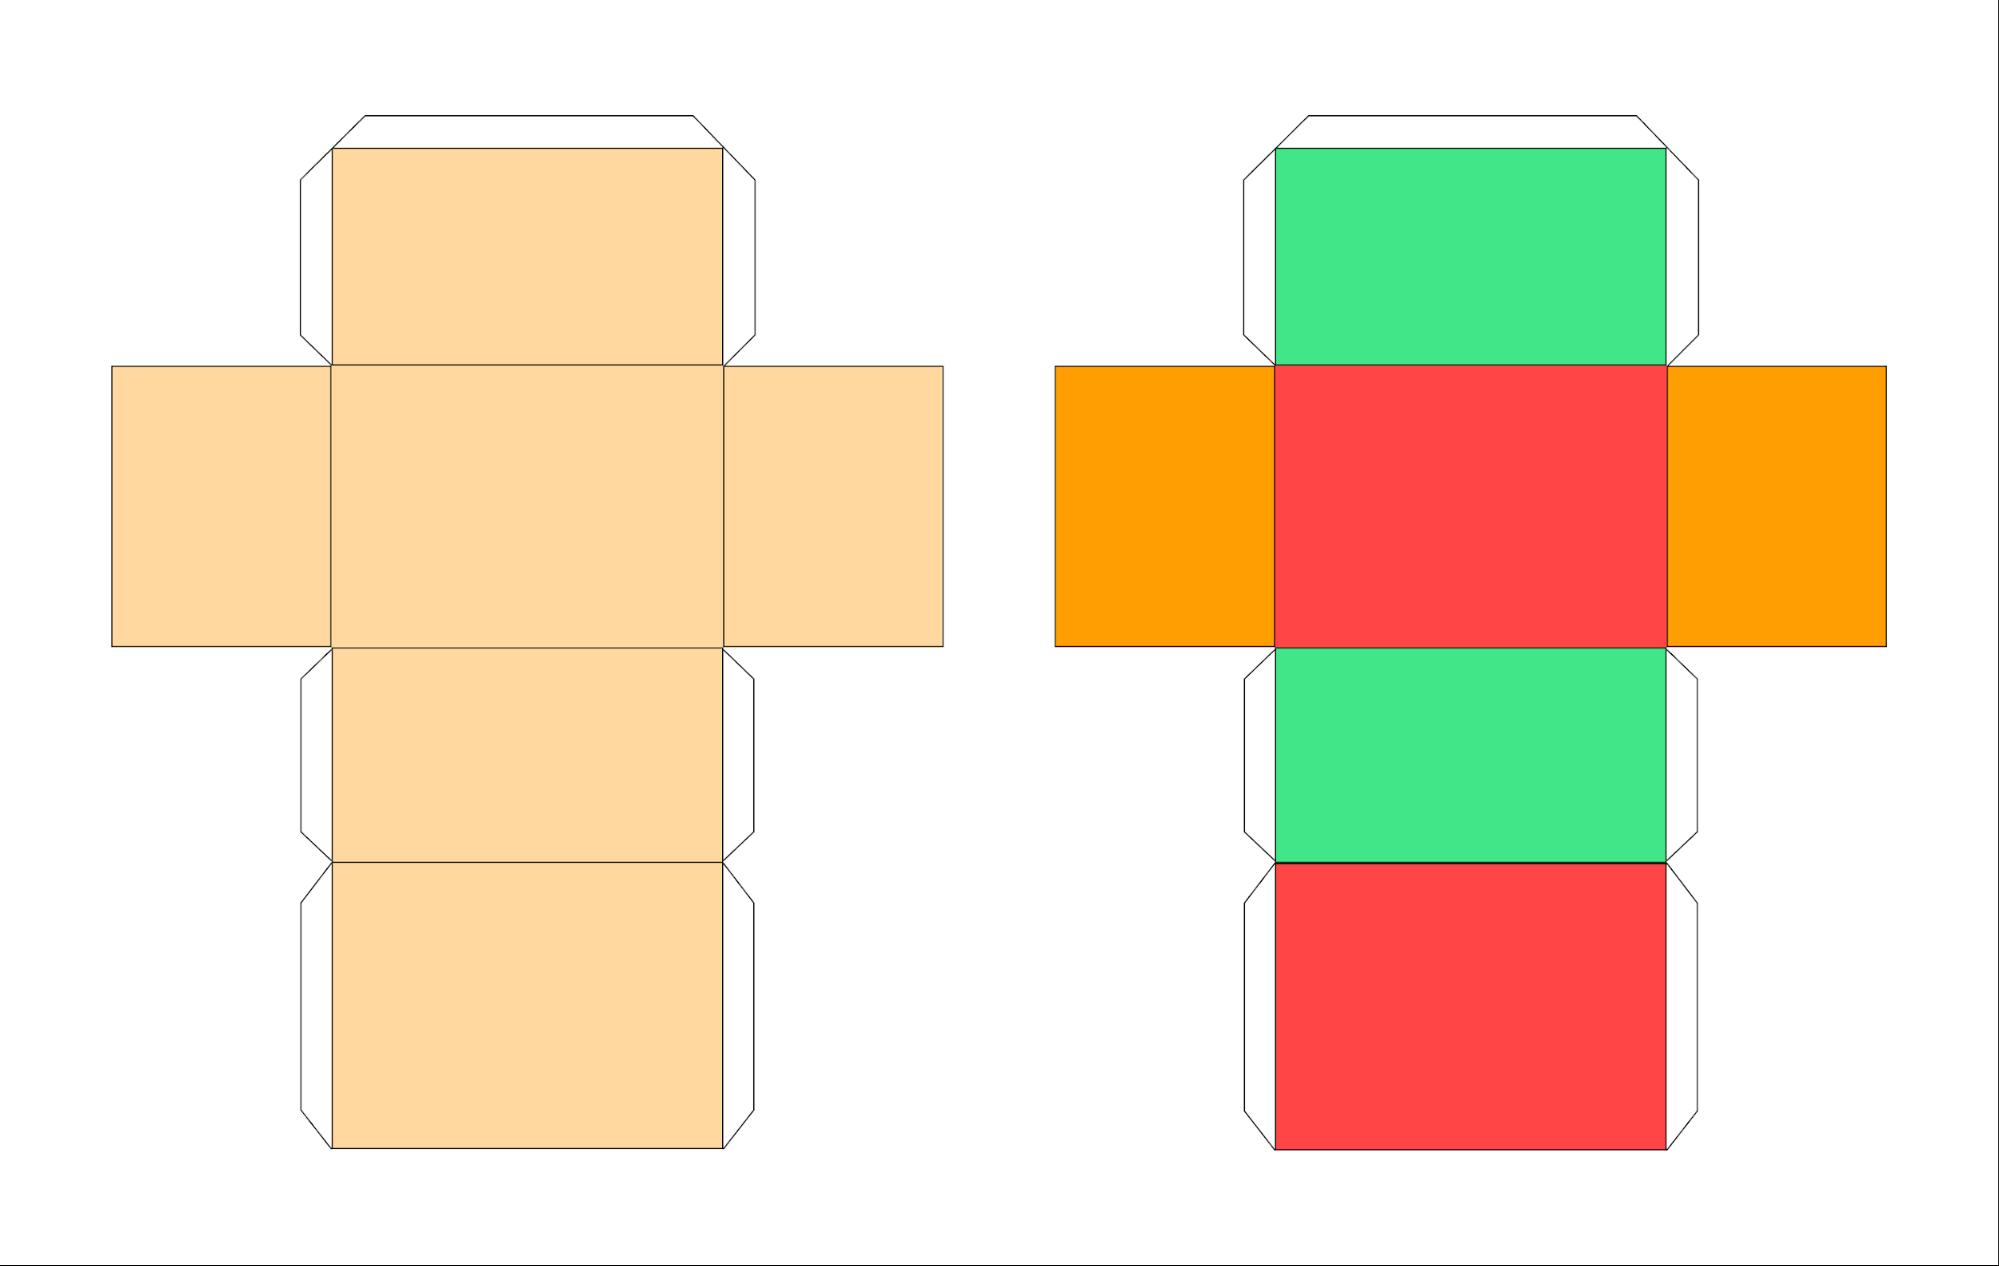 Схема создания прямоугольного параллелепипеда